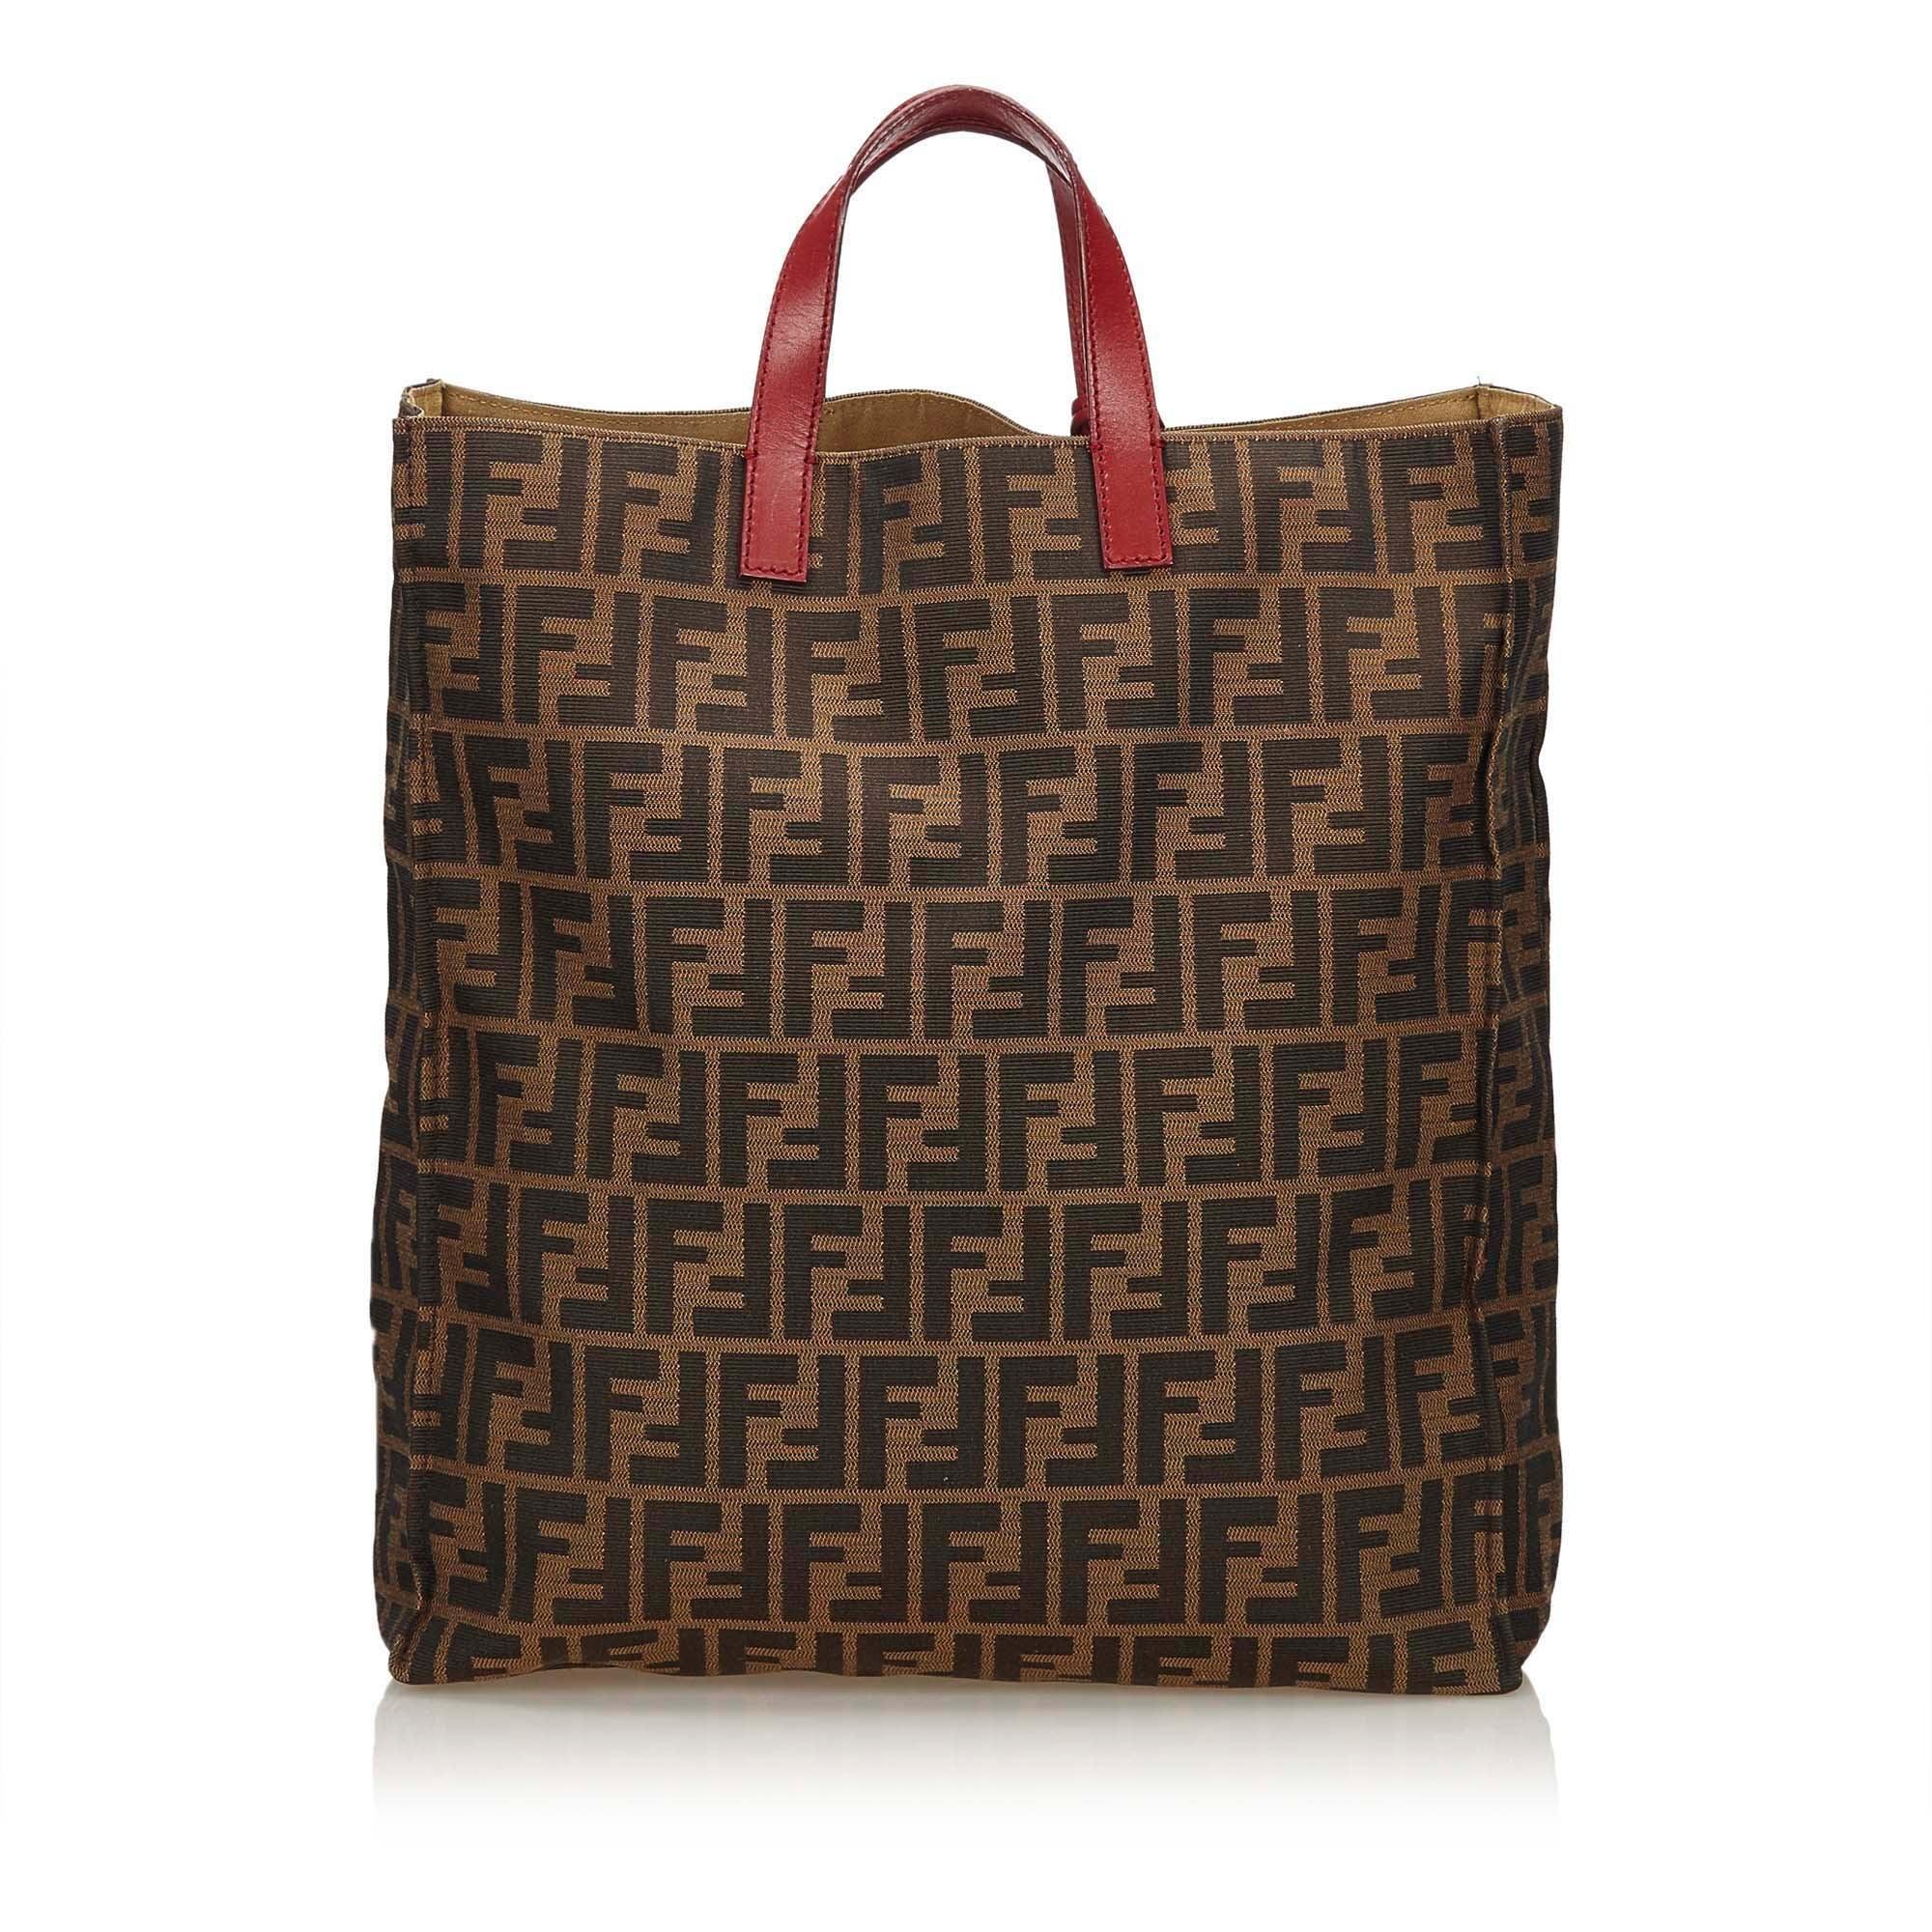 Fendi Brown Zucca Shopper Tote Bag at 1stdibs 7f4343613d6f7